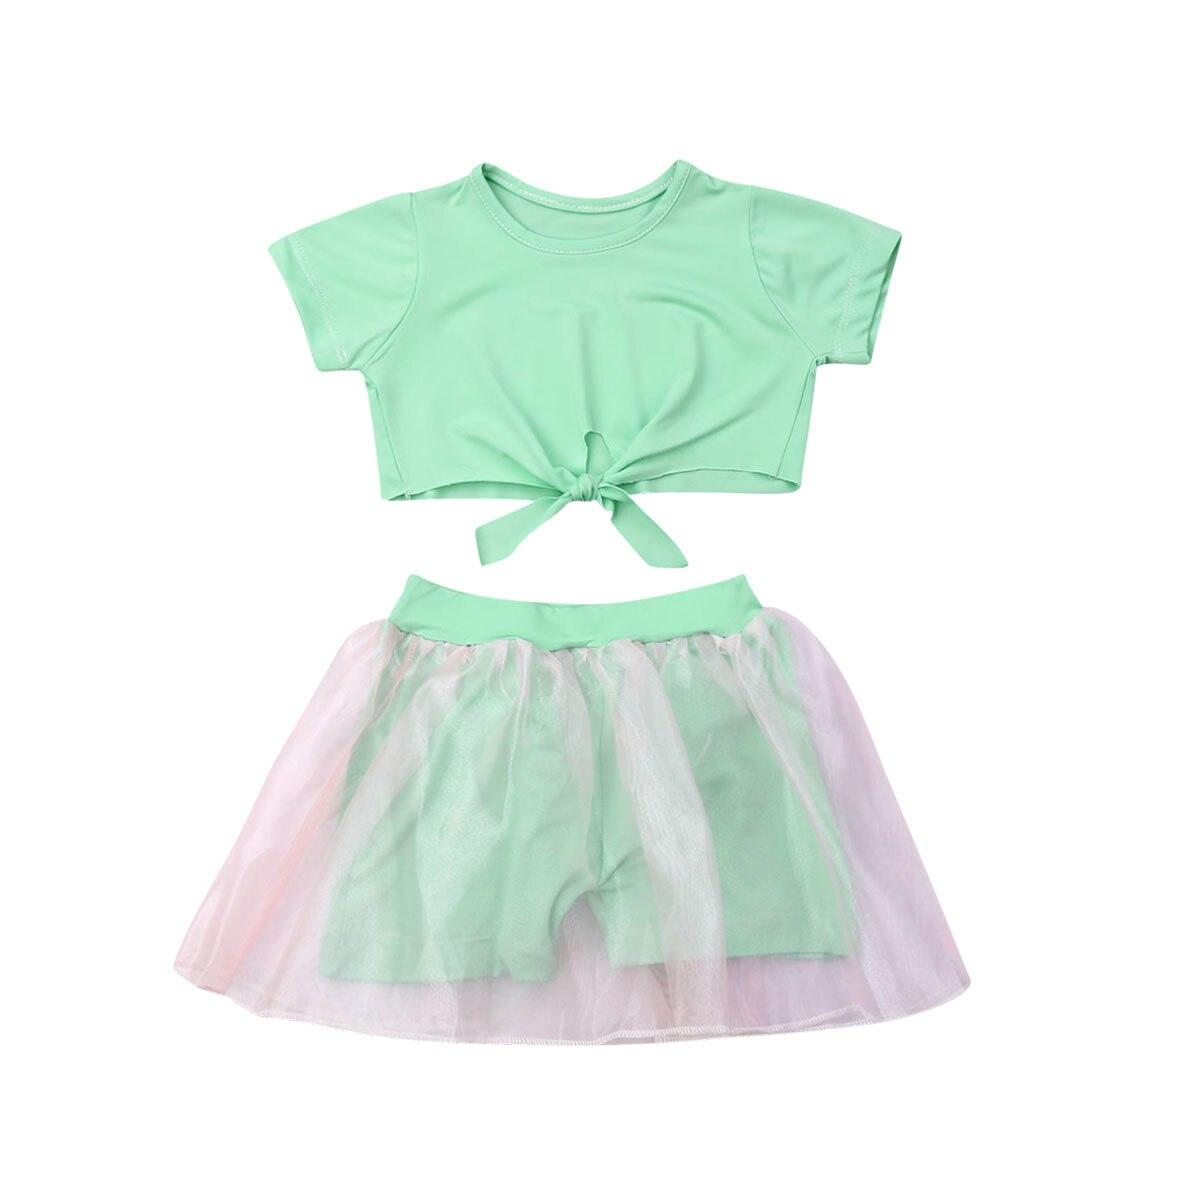 1-6y Sommer Kleinkind Kinder Baby Mädchen Kurzarm Crop Tops Tutu Transparent Kurzen Rock 2 Pcs Outfits Mode Kinder Kleidung